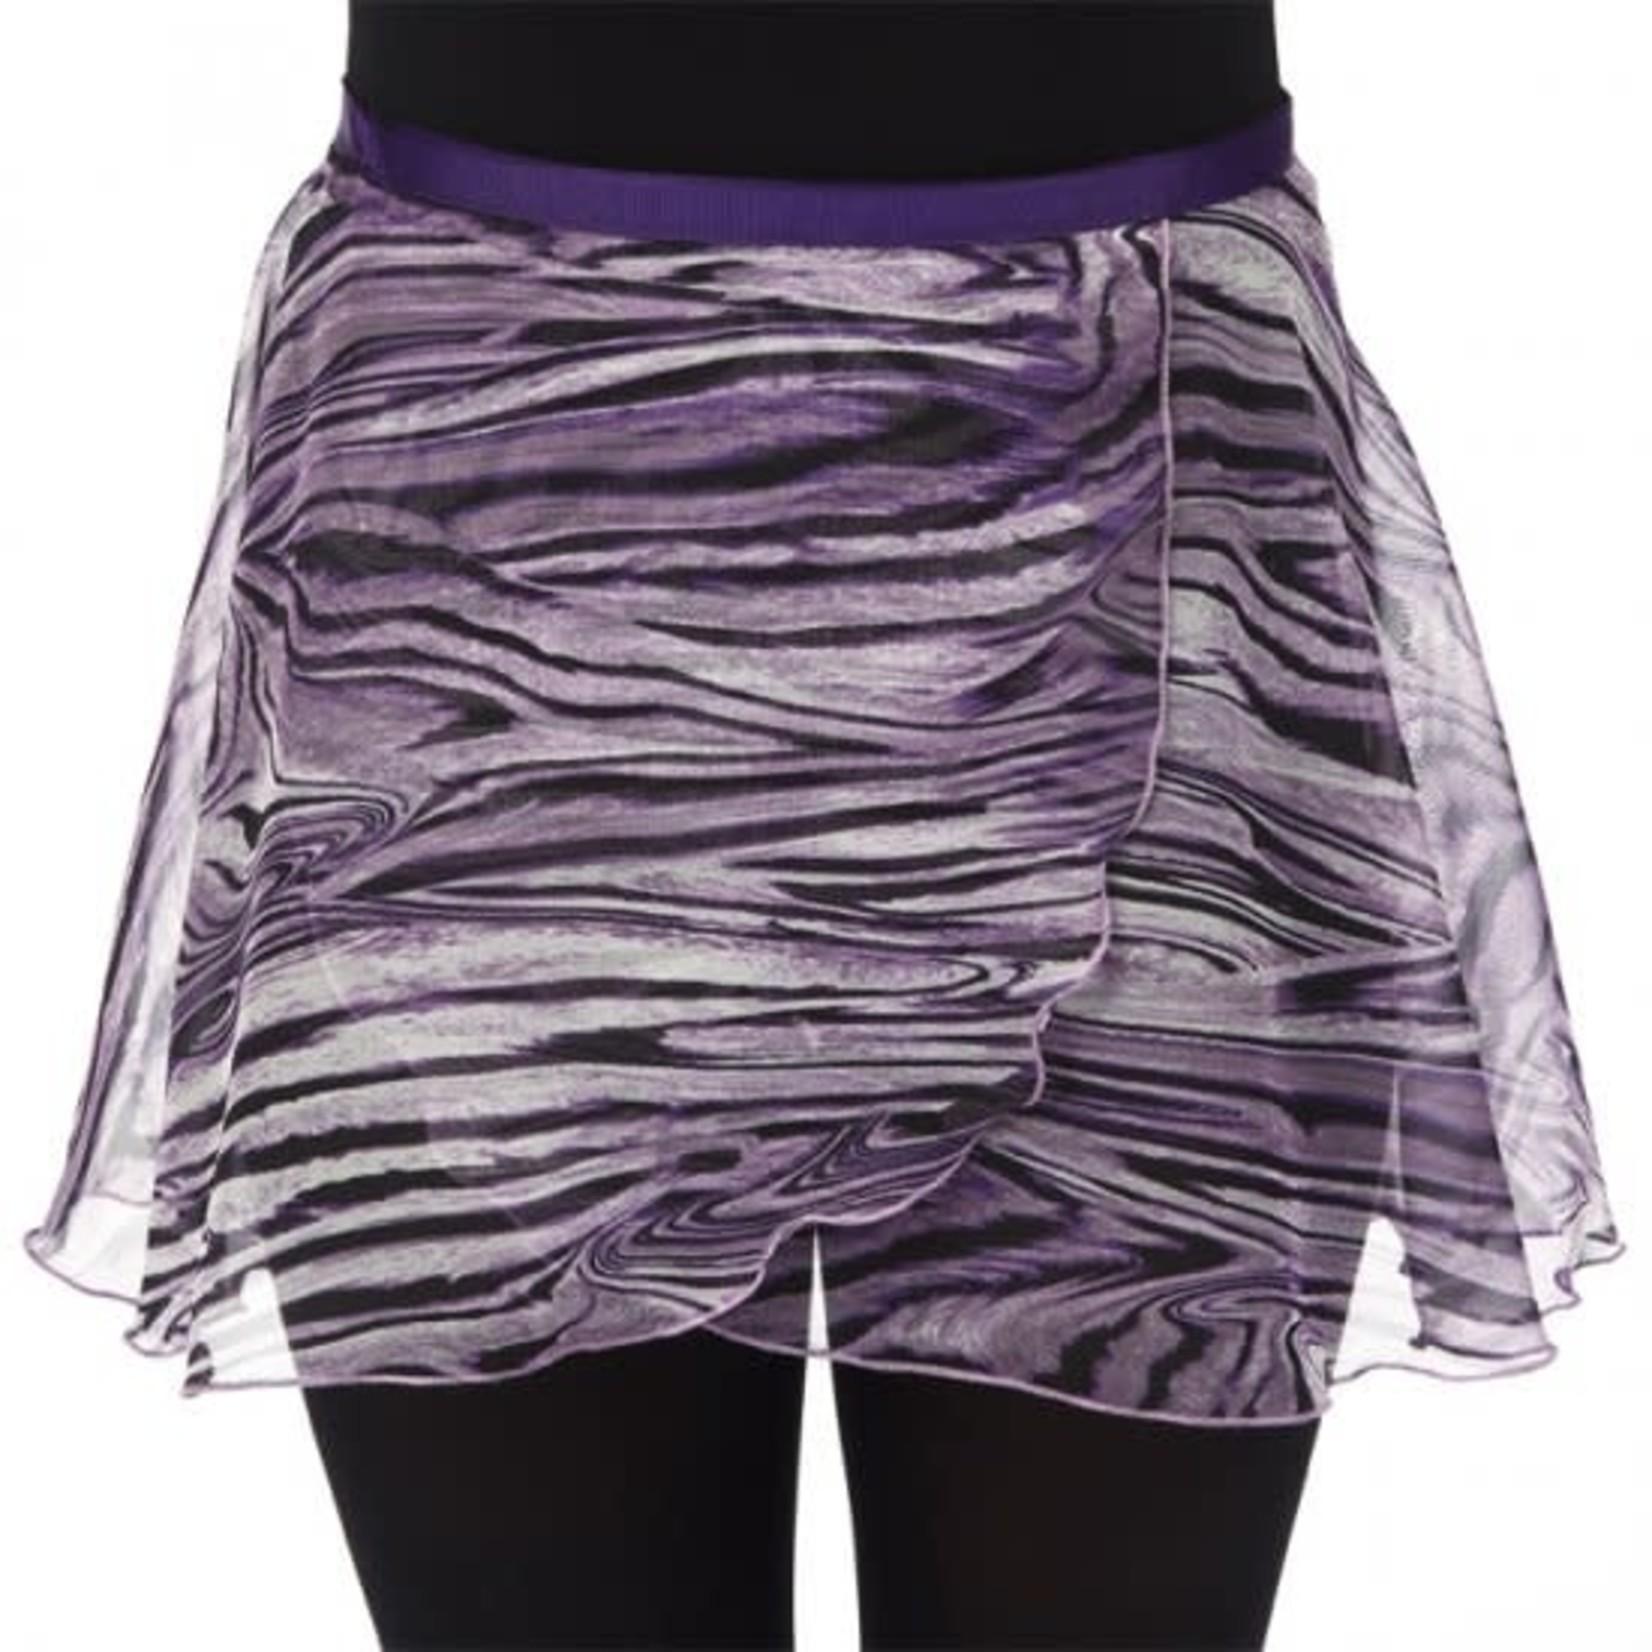 "Dasha Designs Dasha Designs 4481PP 14"" Purple Marble Print Wrap"